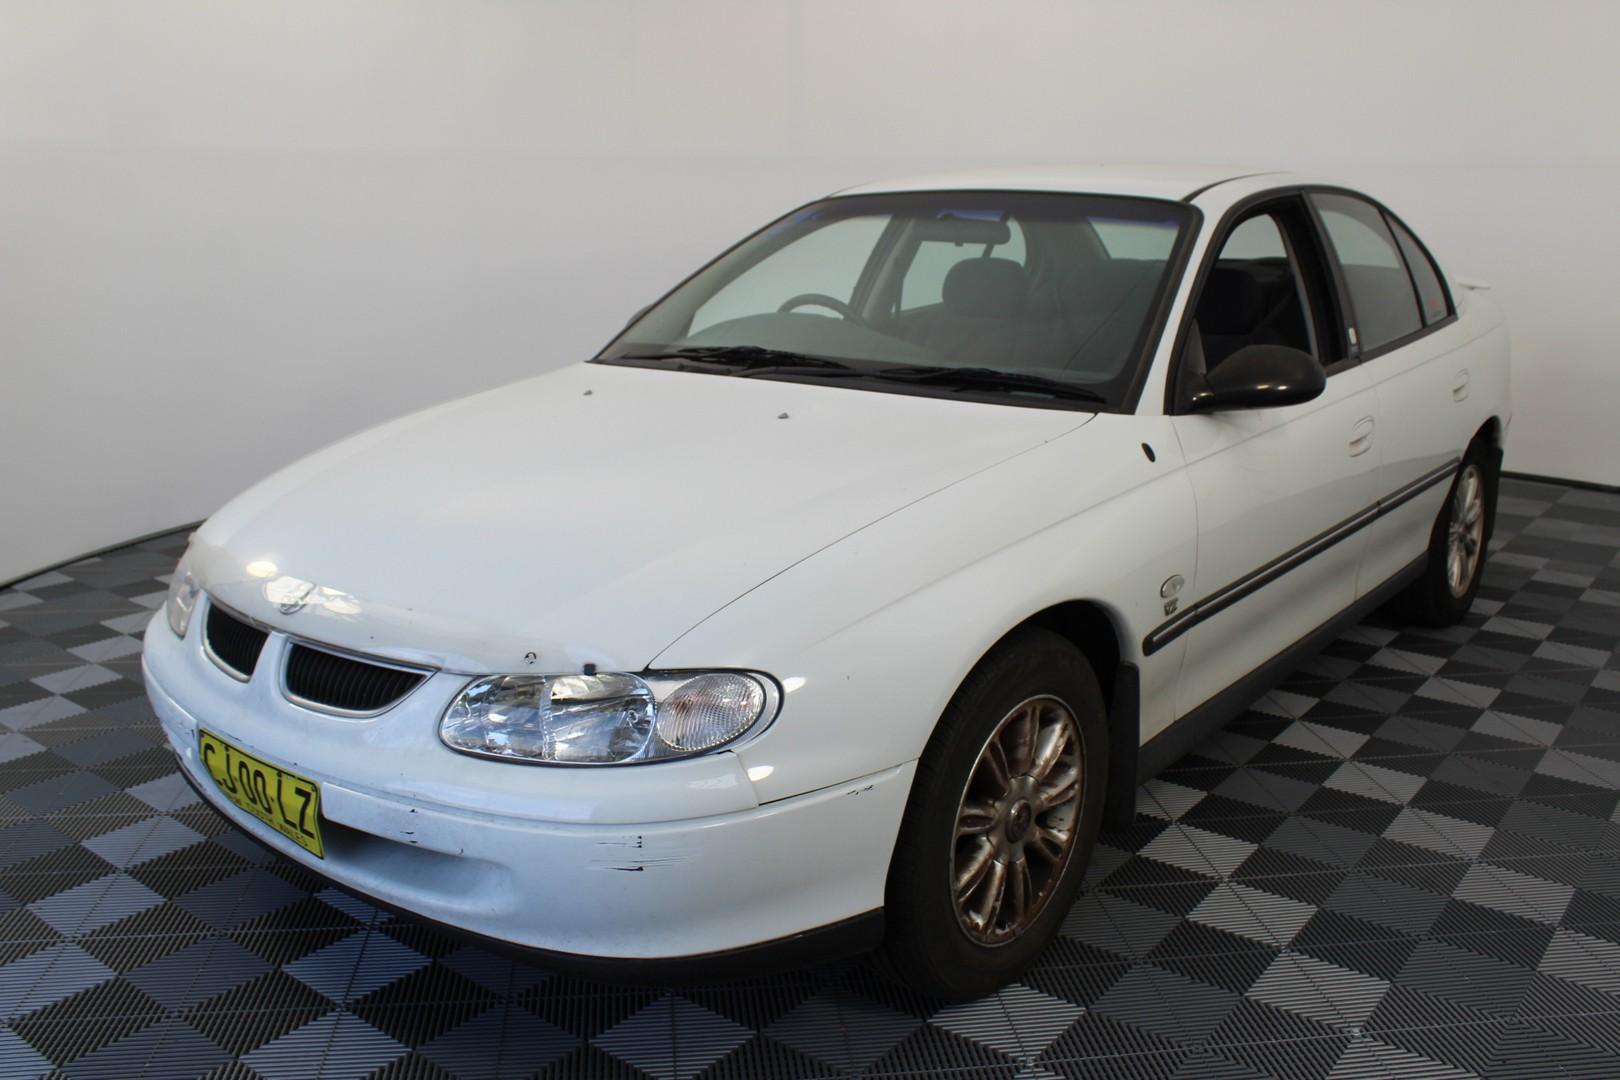 2000 Holden Commodore Olympic Edition VTII Automatic Sedan